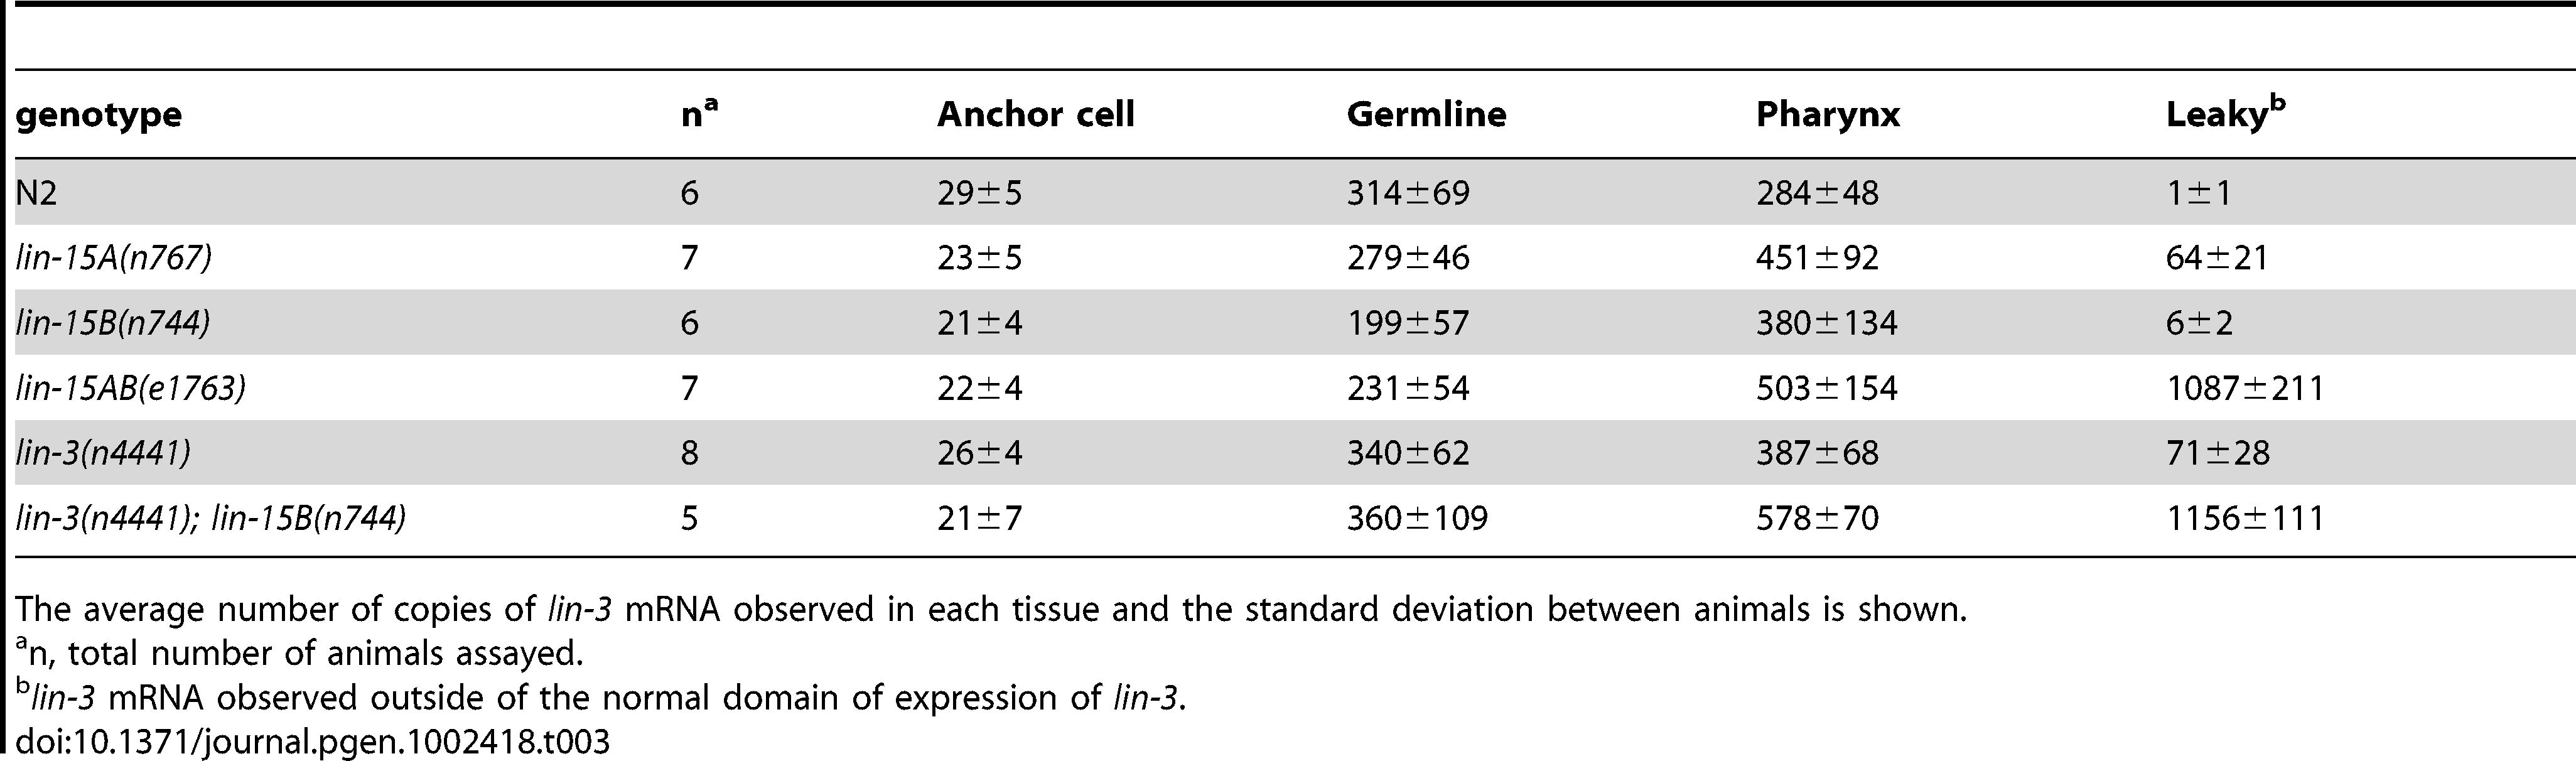 Quantification of <i>lin-3</i> expression.